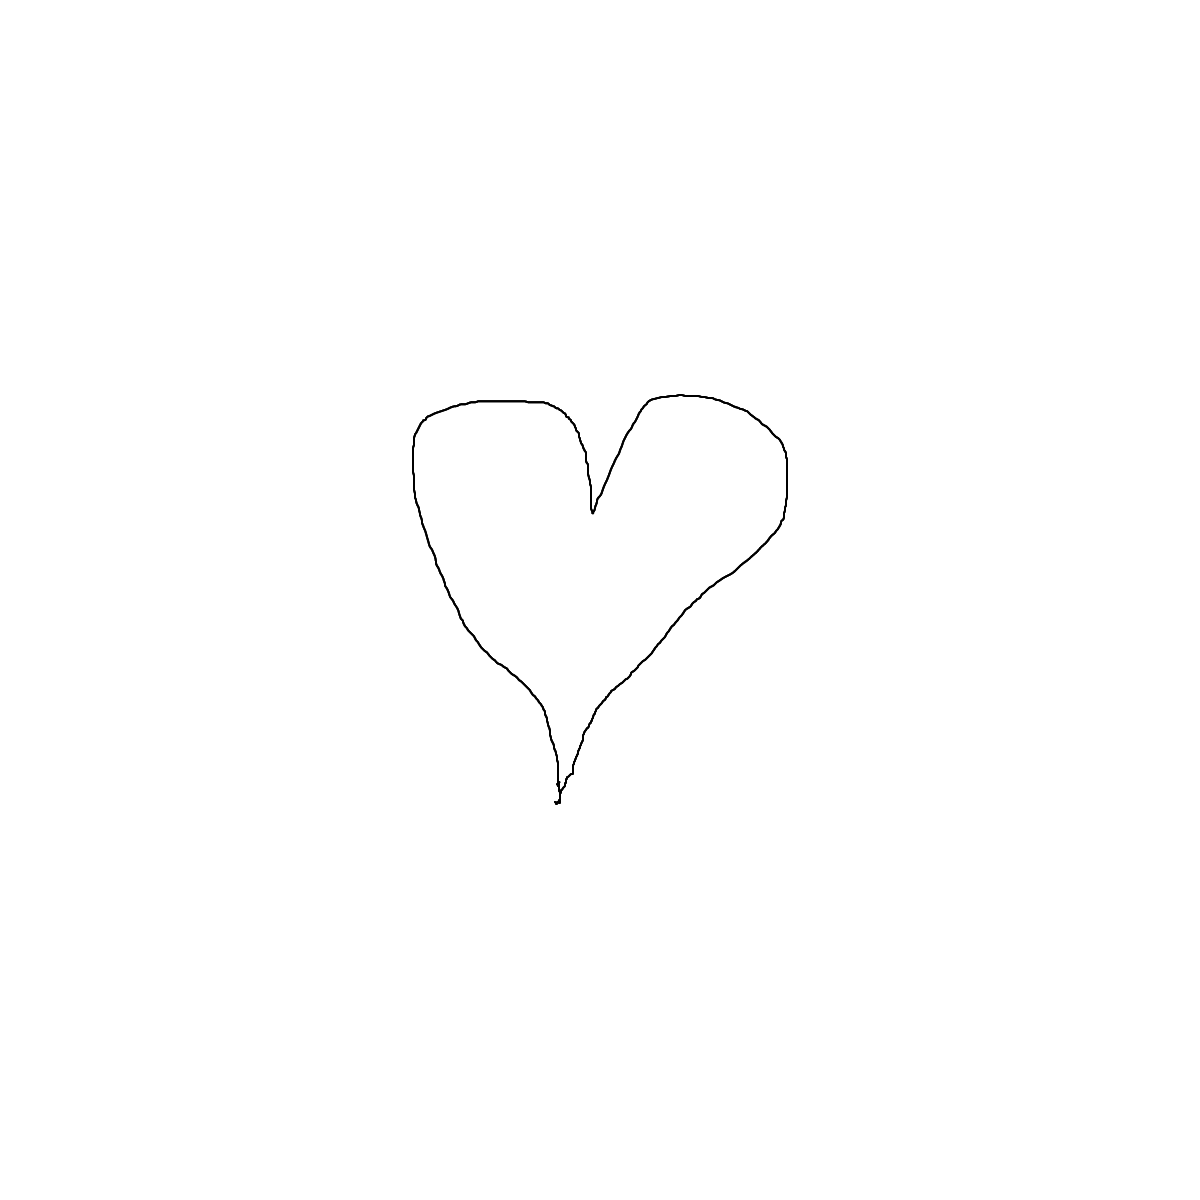 BAAAM drawing#23866 lat:61.4848861694335940lng: 21.7894229888916000